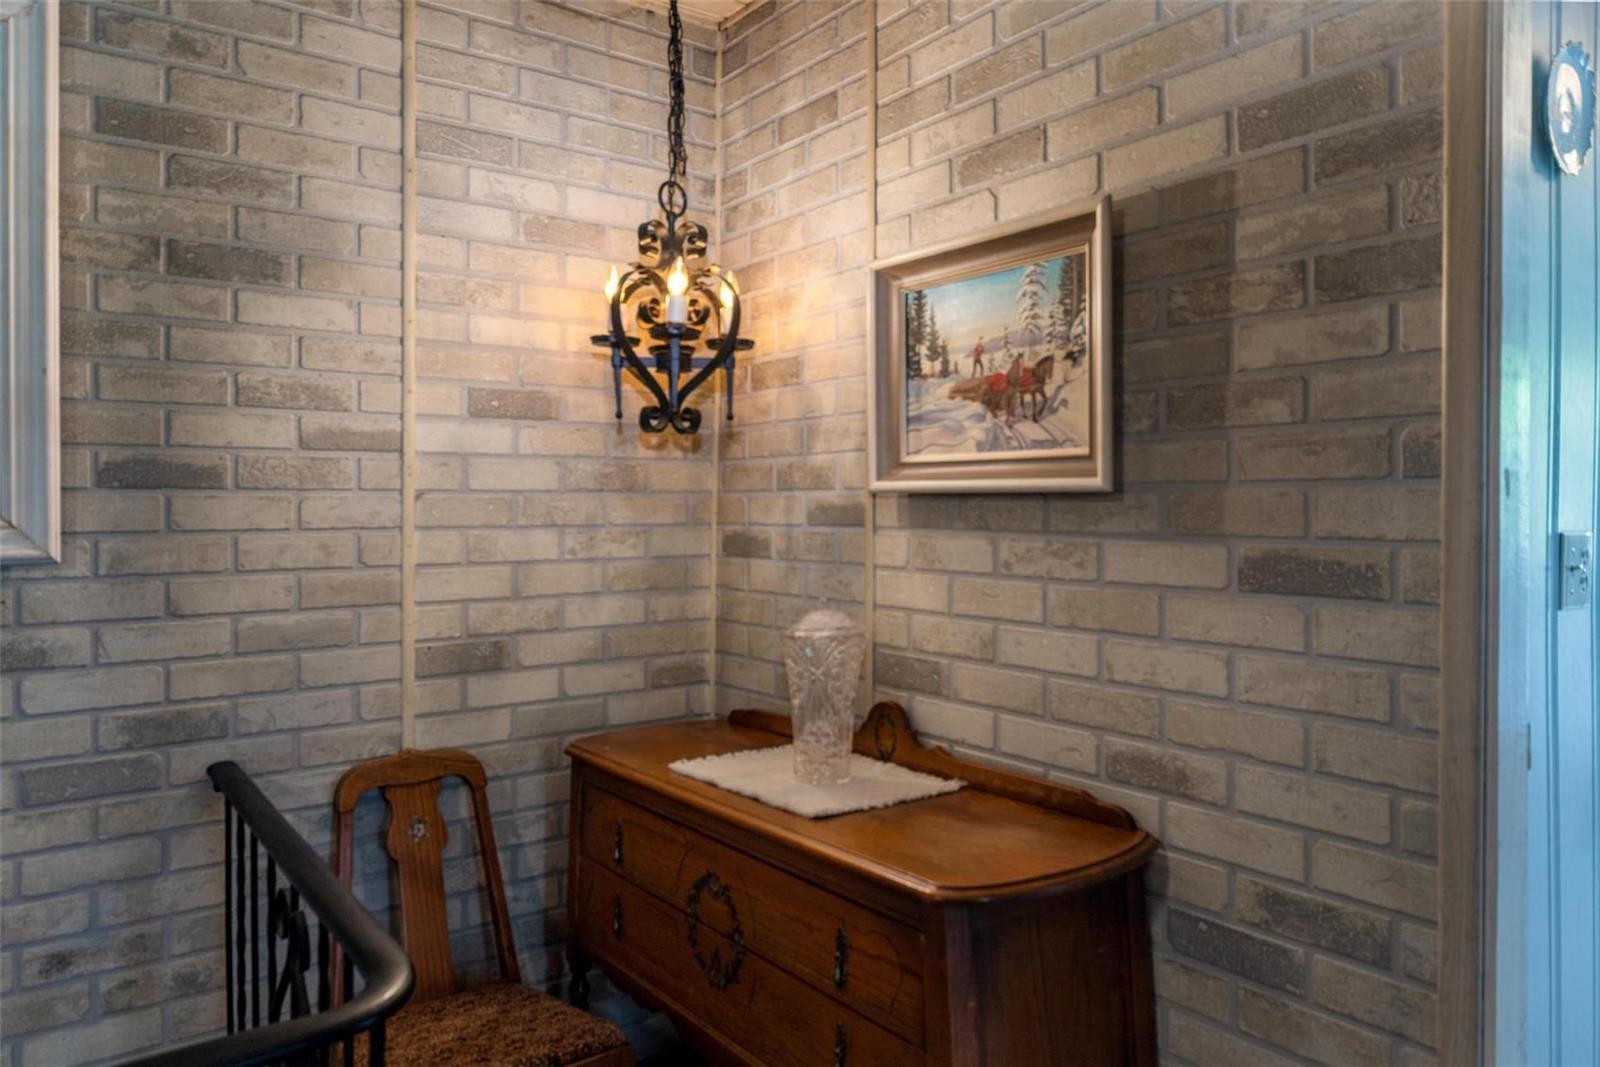 4602 Schubert Road,, Armstrong, British Columbia  V0E 1B4 - Photo 27 - 10232683